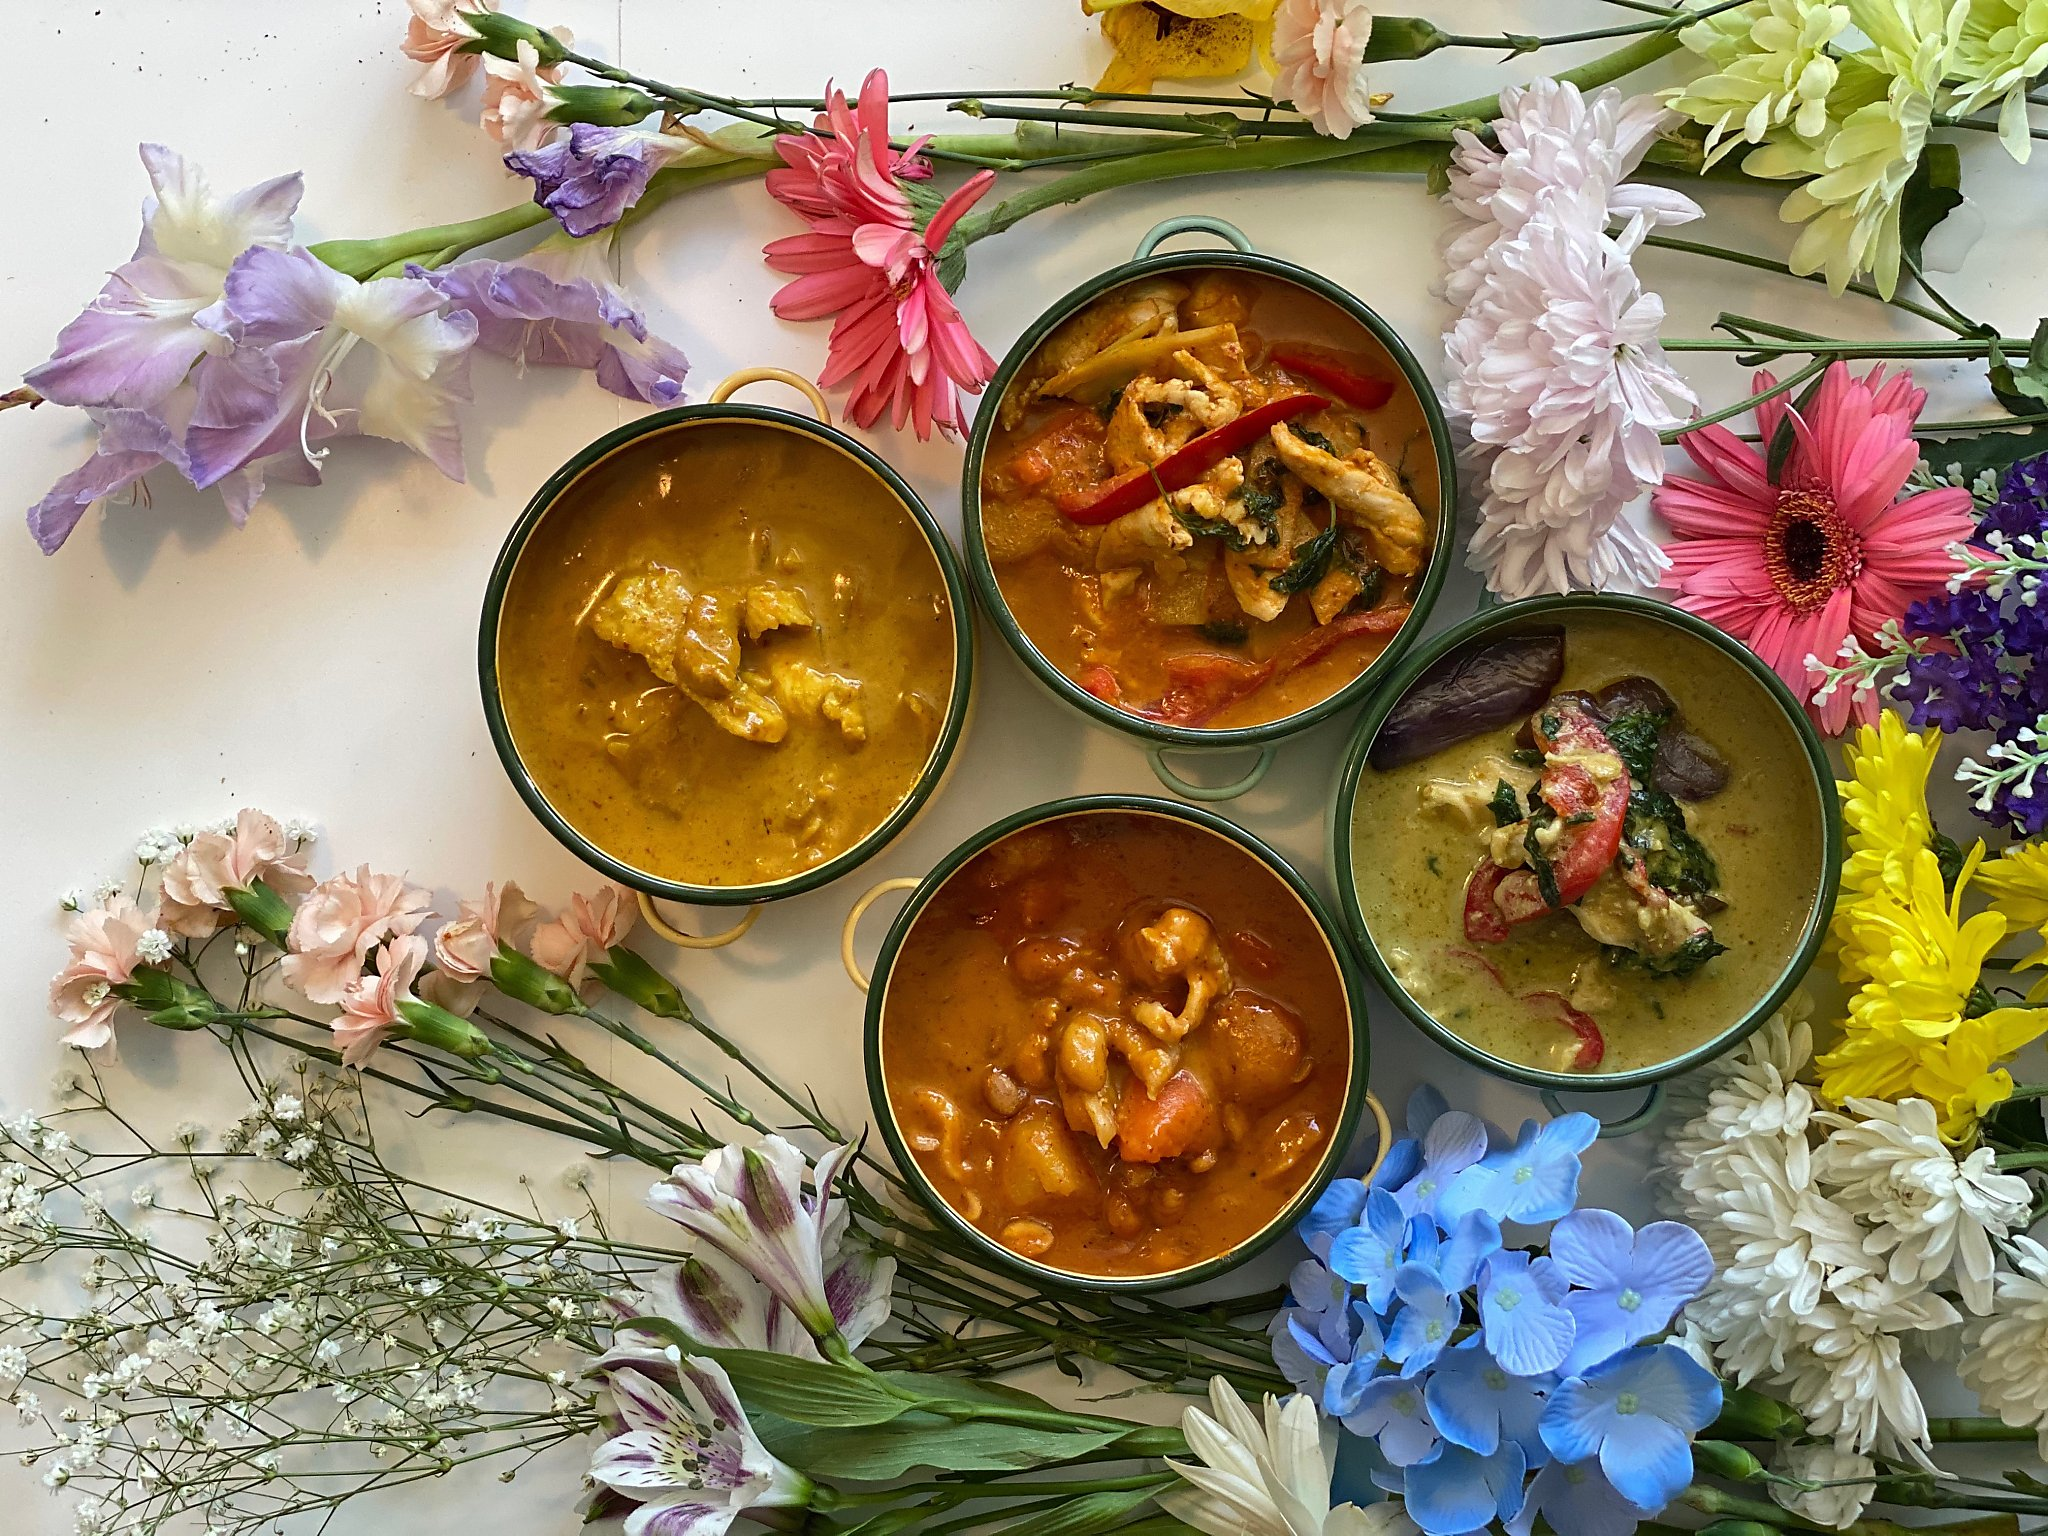 San Franciscou2019s new Le Moon Thai Eatery offers alternative take on Thai